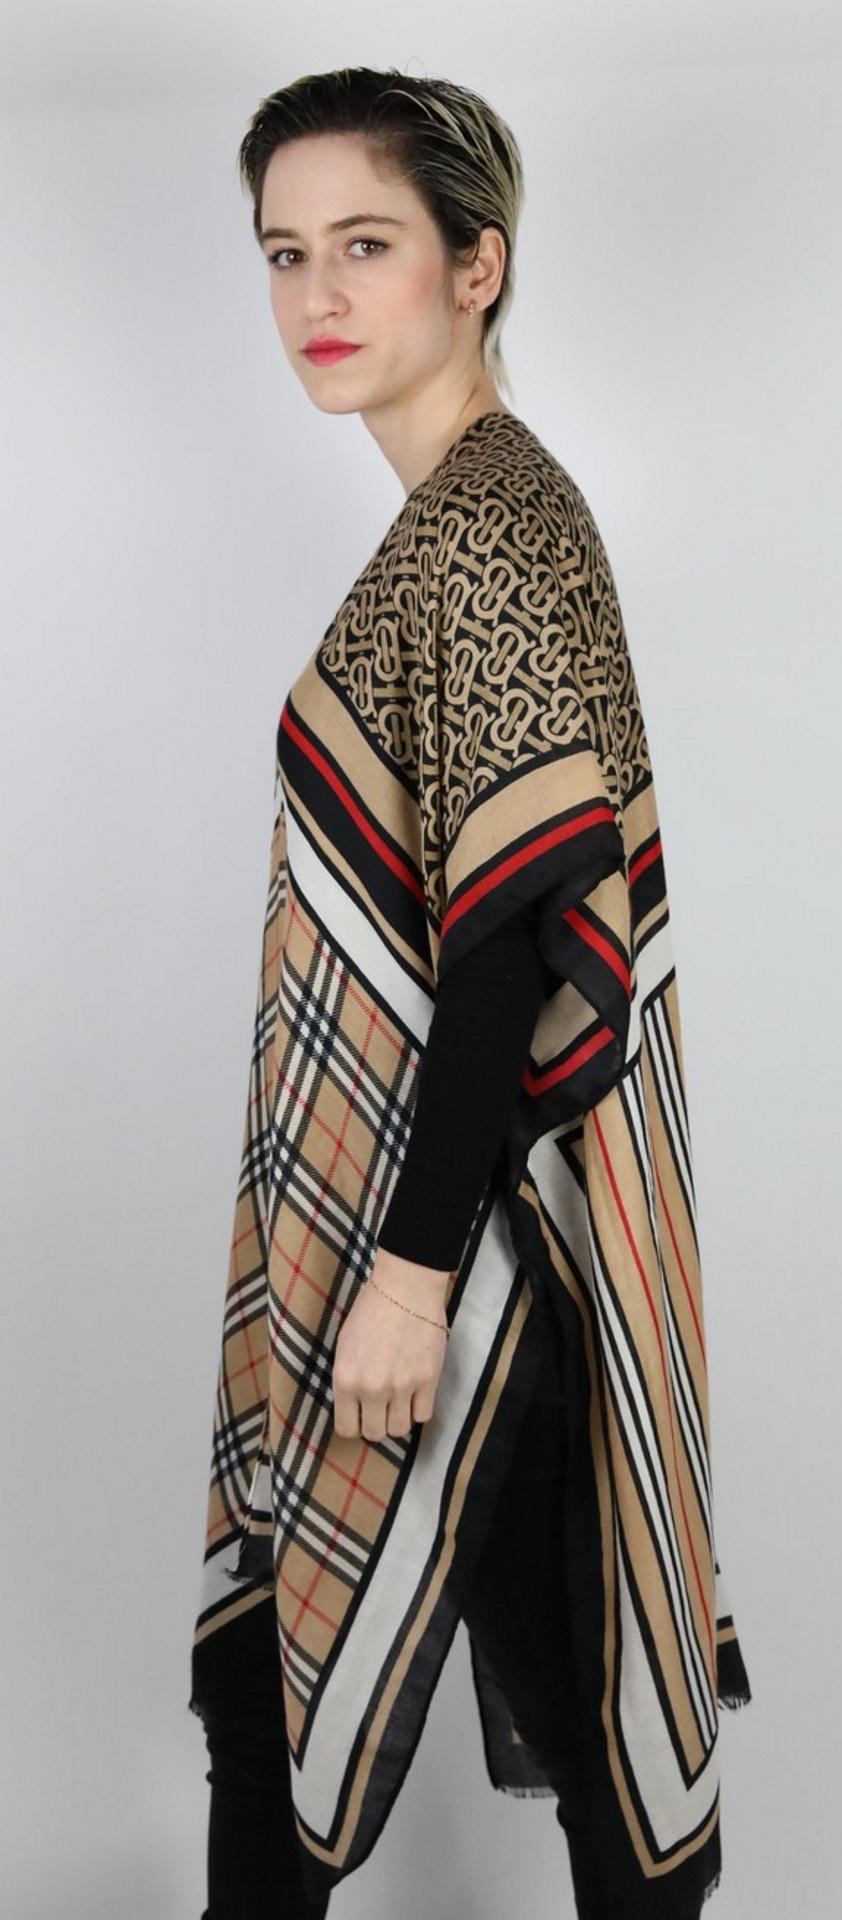 CLOTHES13 STOLA DONNA FOULARD CARDIGAN COPRISPALLE 2 1stAmerican elegante stola da donna foulard cardigan coprispalle